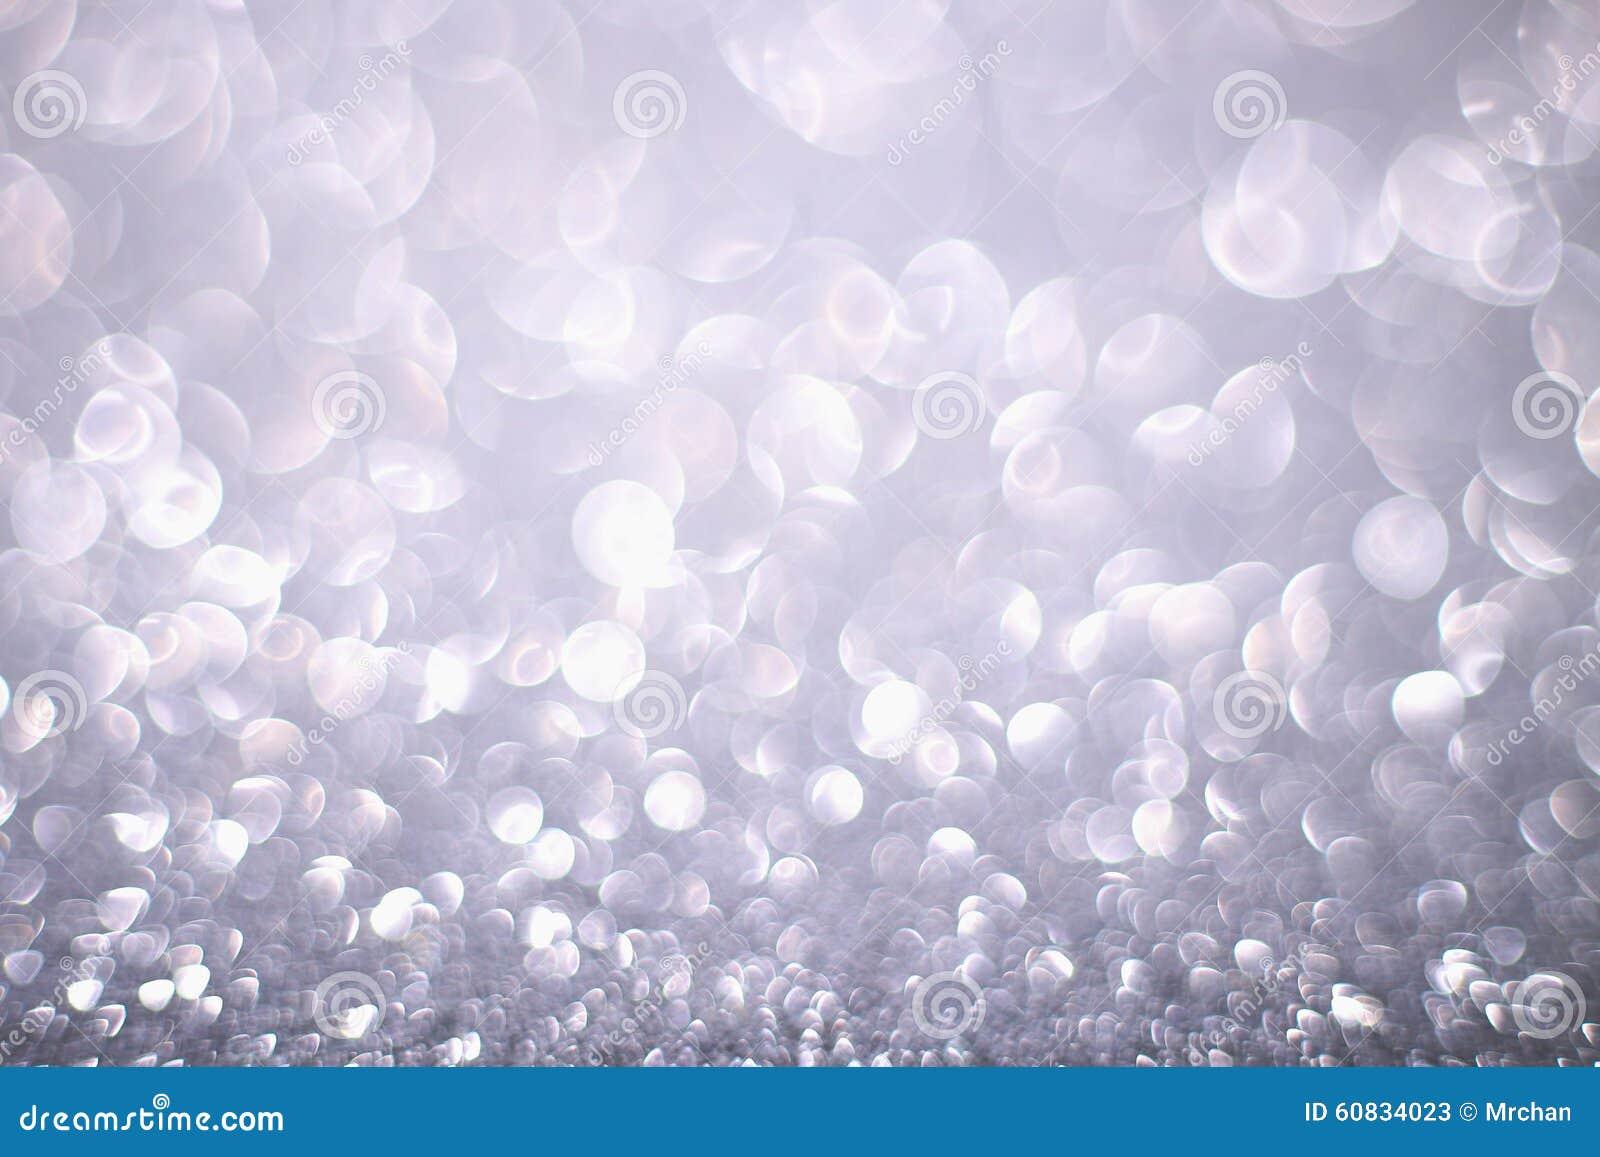 Bokeh Glitter Abstract Background Wallpaper For Wedding And Christmas Festival Design